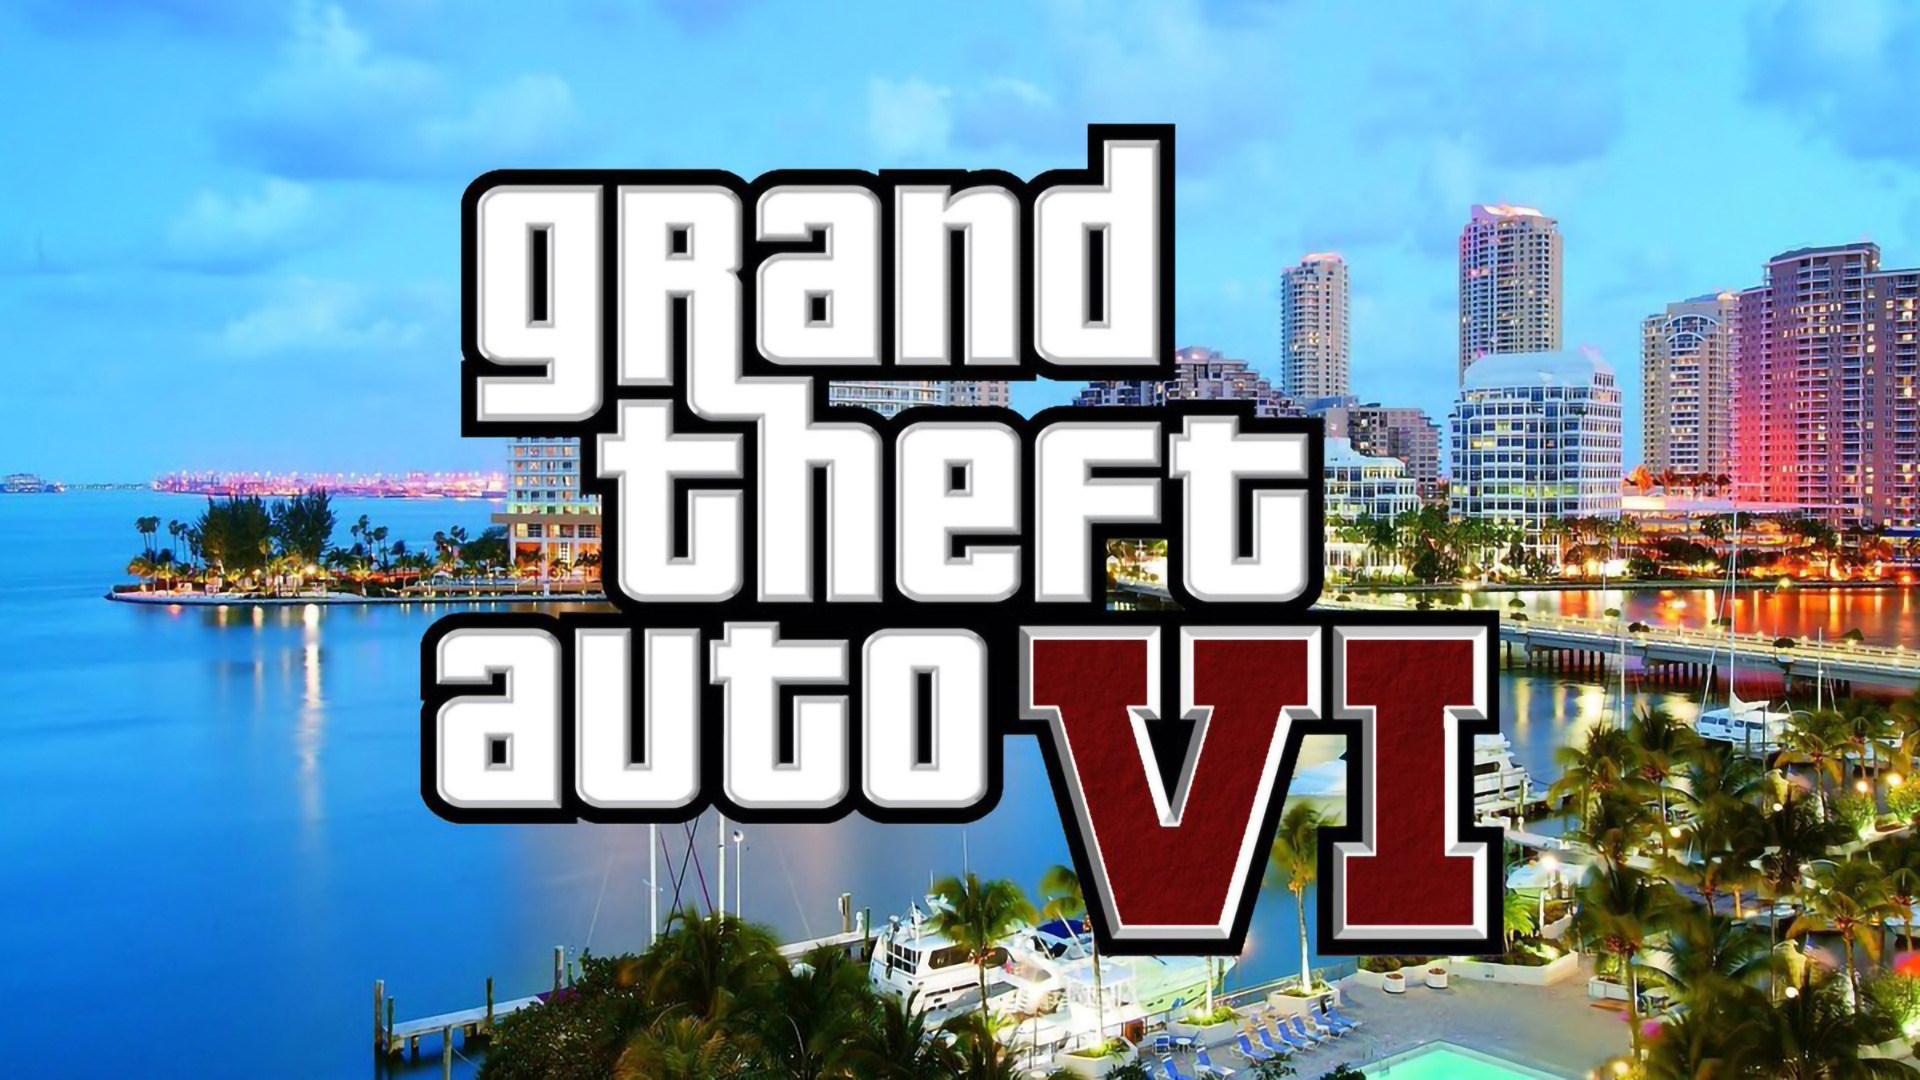 Spiele, Rockstar Games, Gta, Grand Theft Auto, Take Two, GTA 6, Grand Theft Auto 6